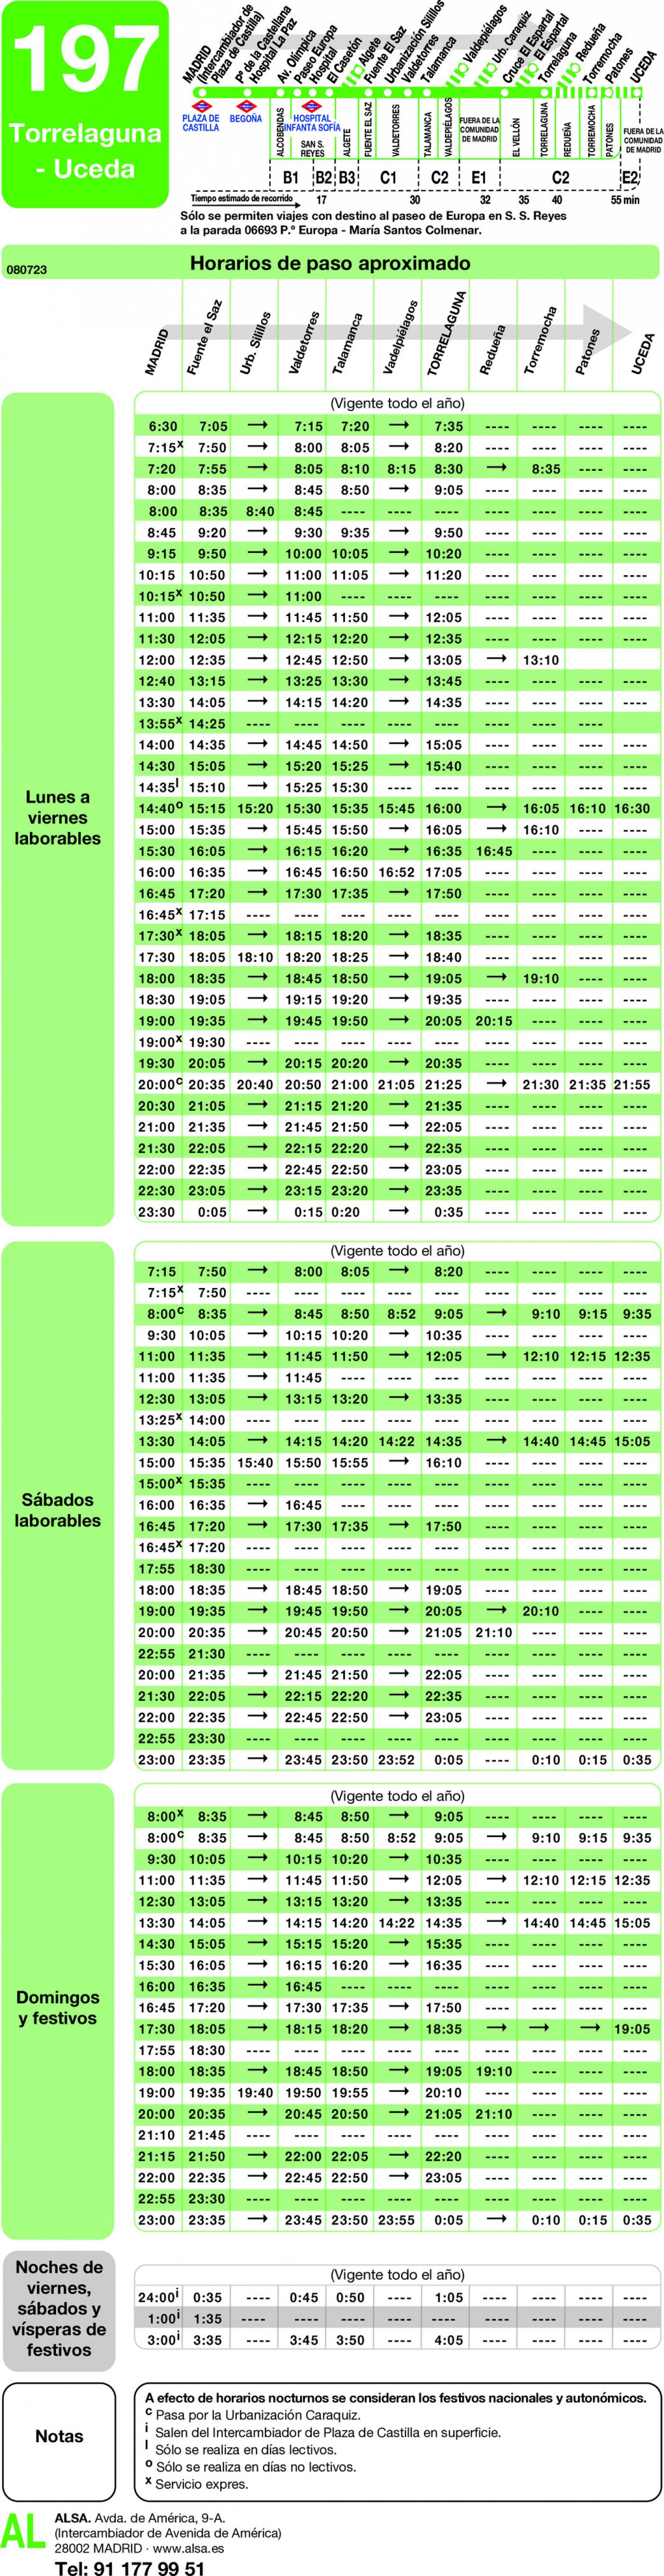 http://www.redtransporte.com/img/transporte/madrid/autobuses-interurbanos/horario-ida-197-madrid-torrelaguna-uceda-autobuses-interurbanos.jpg